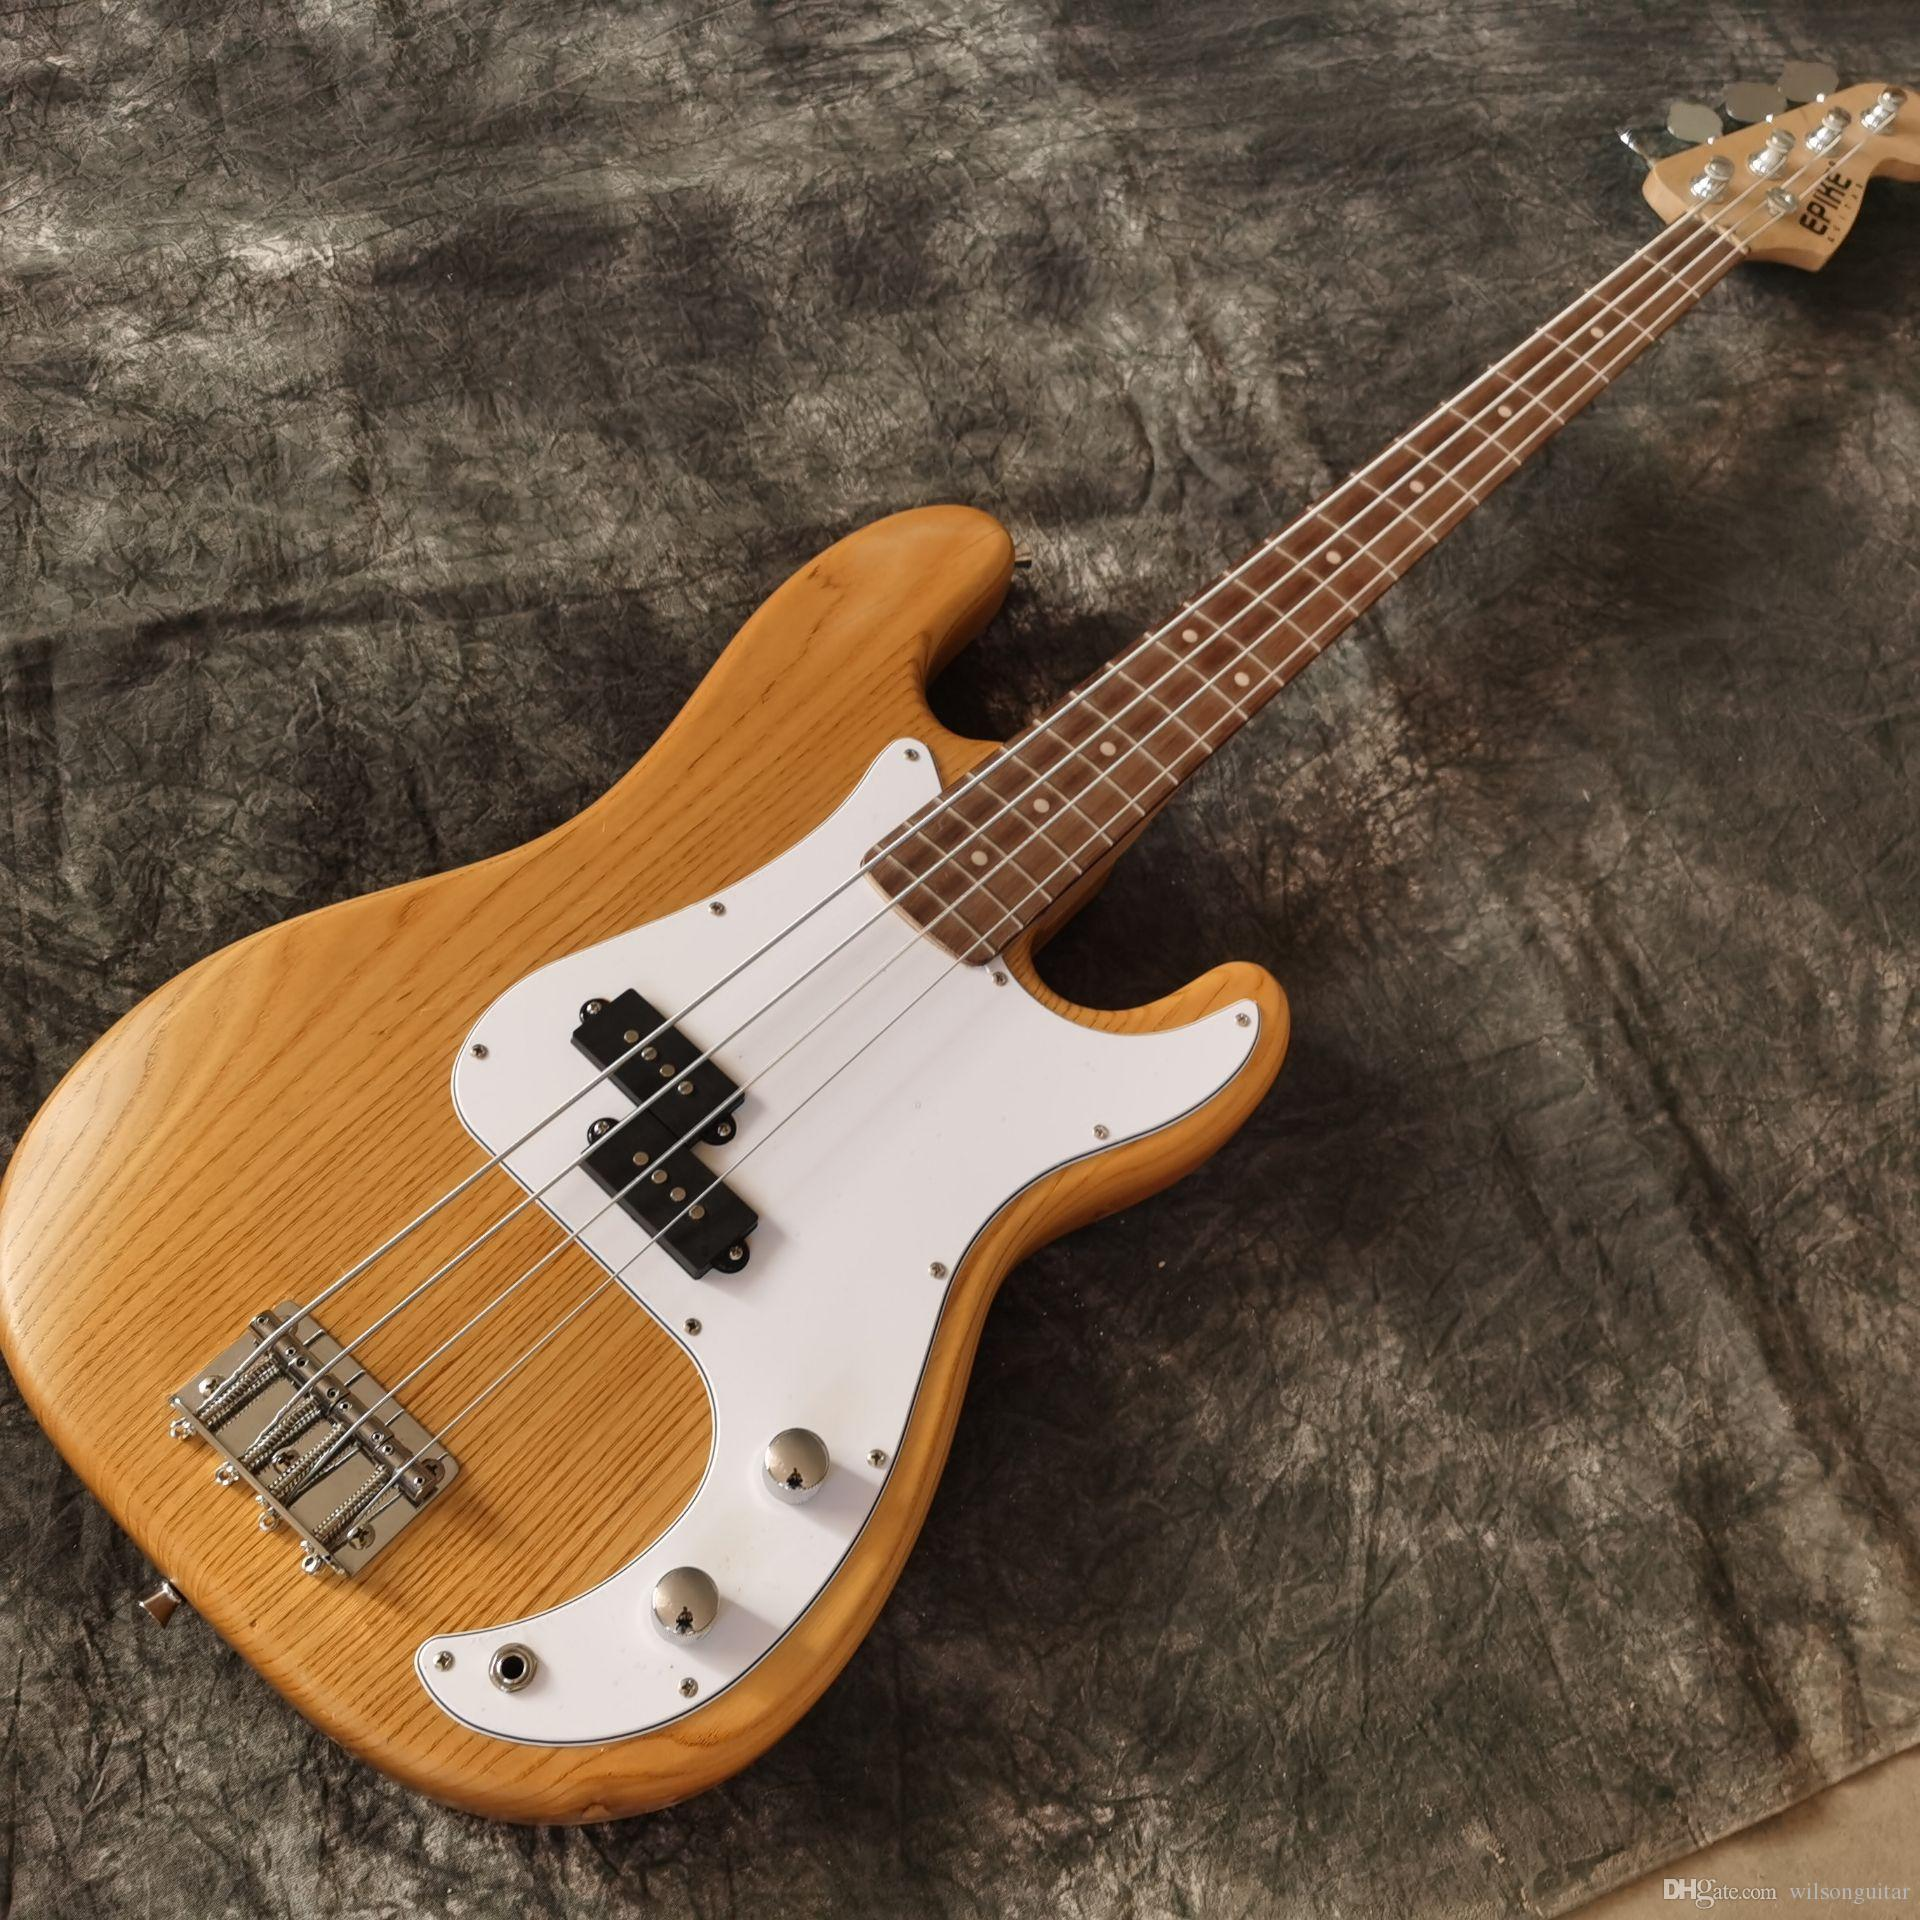 Novo estilo, de alta qualidade baixo elétrico guitar.handmade 4 picadas guitarra.rosewood baixo fotos fingerboard.real